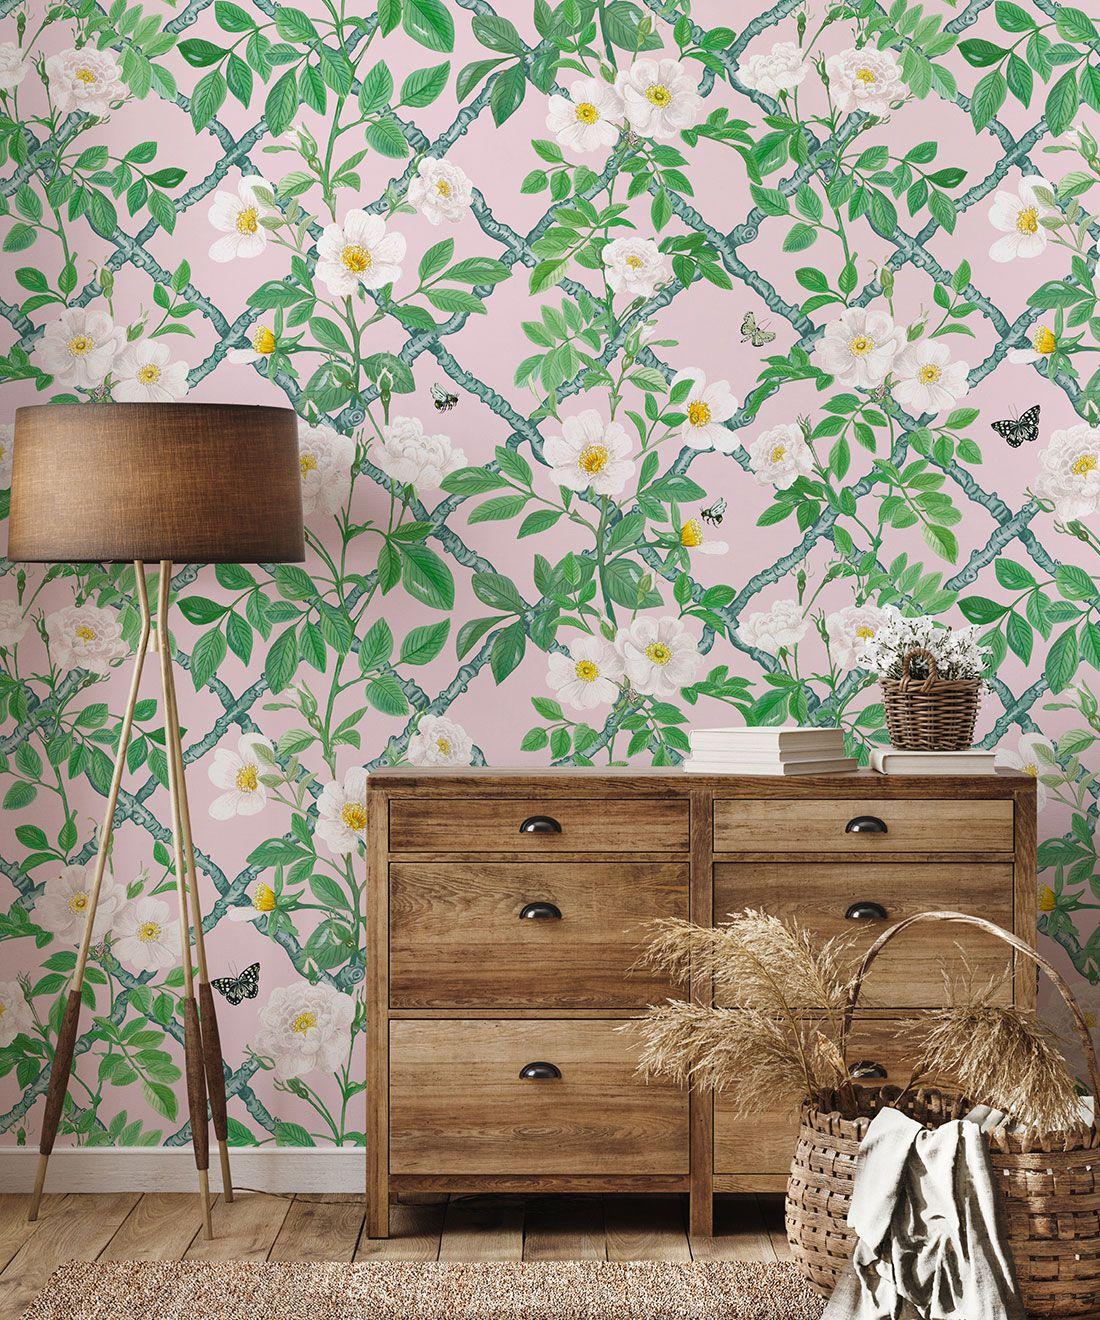 Treilage Wallpaper • Floral Wallpaper • Blush • Insitu